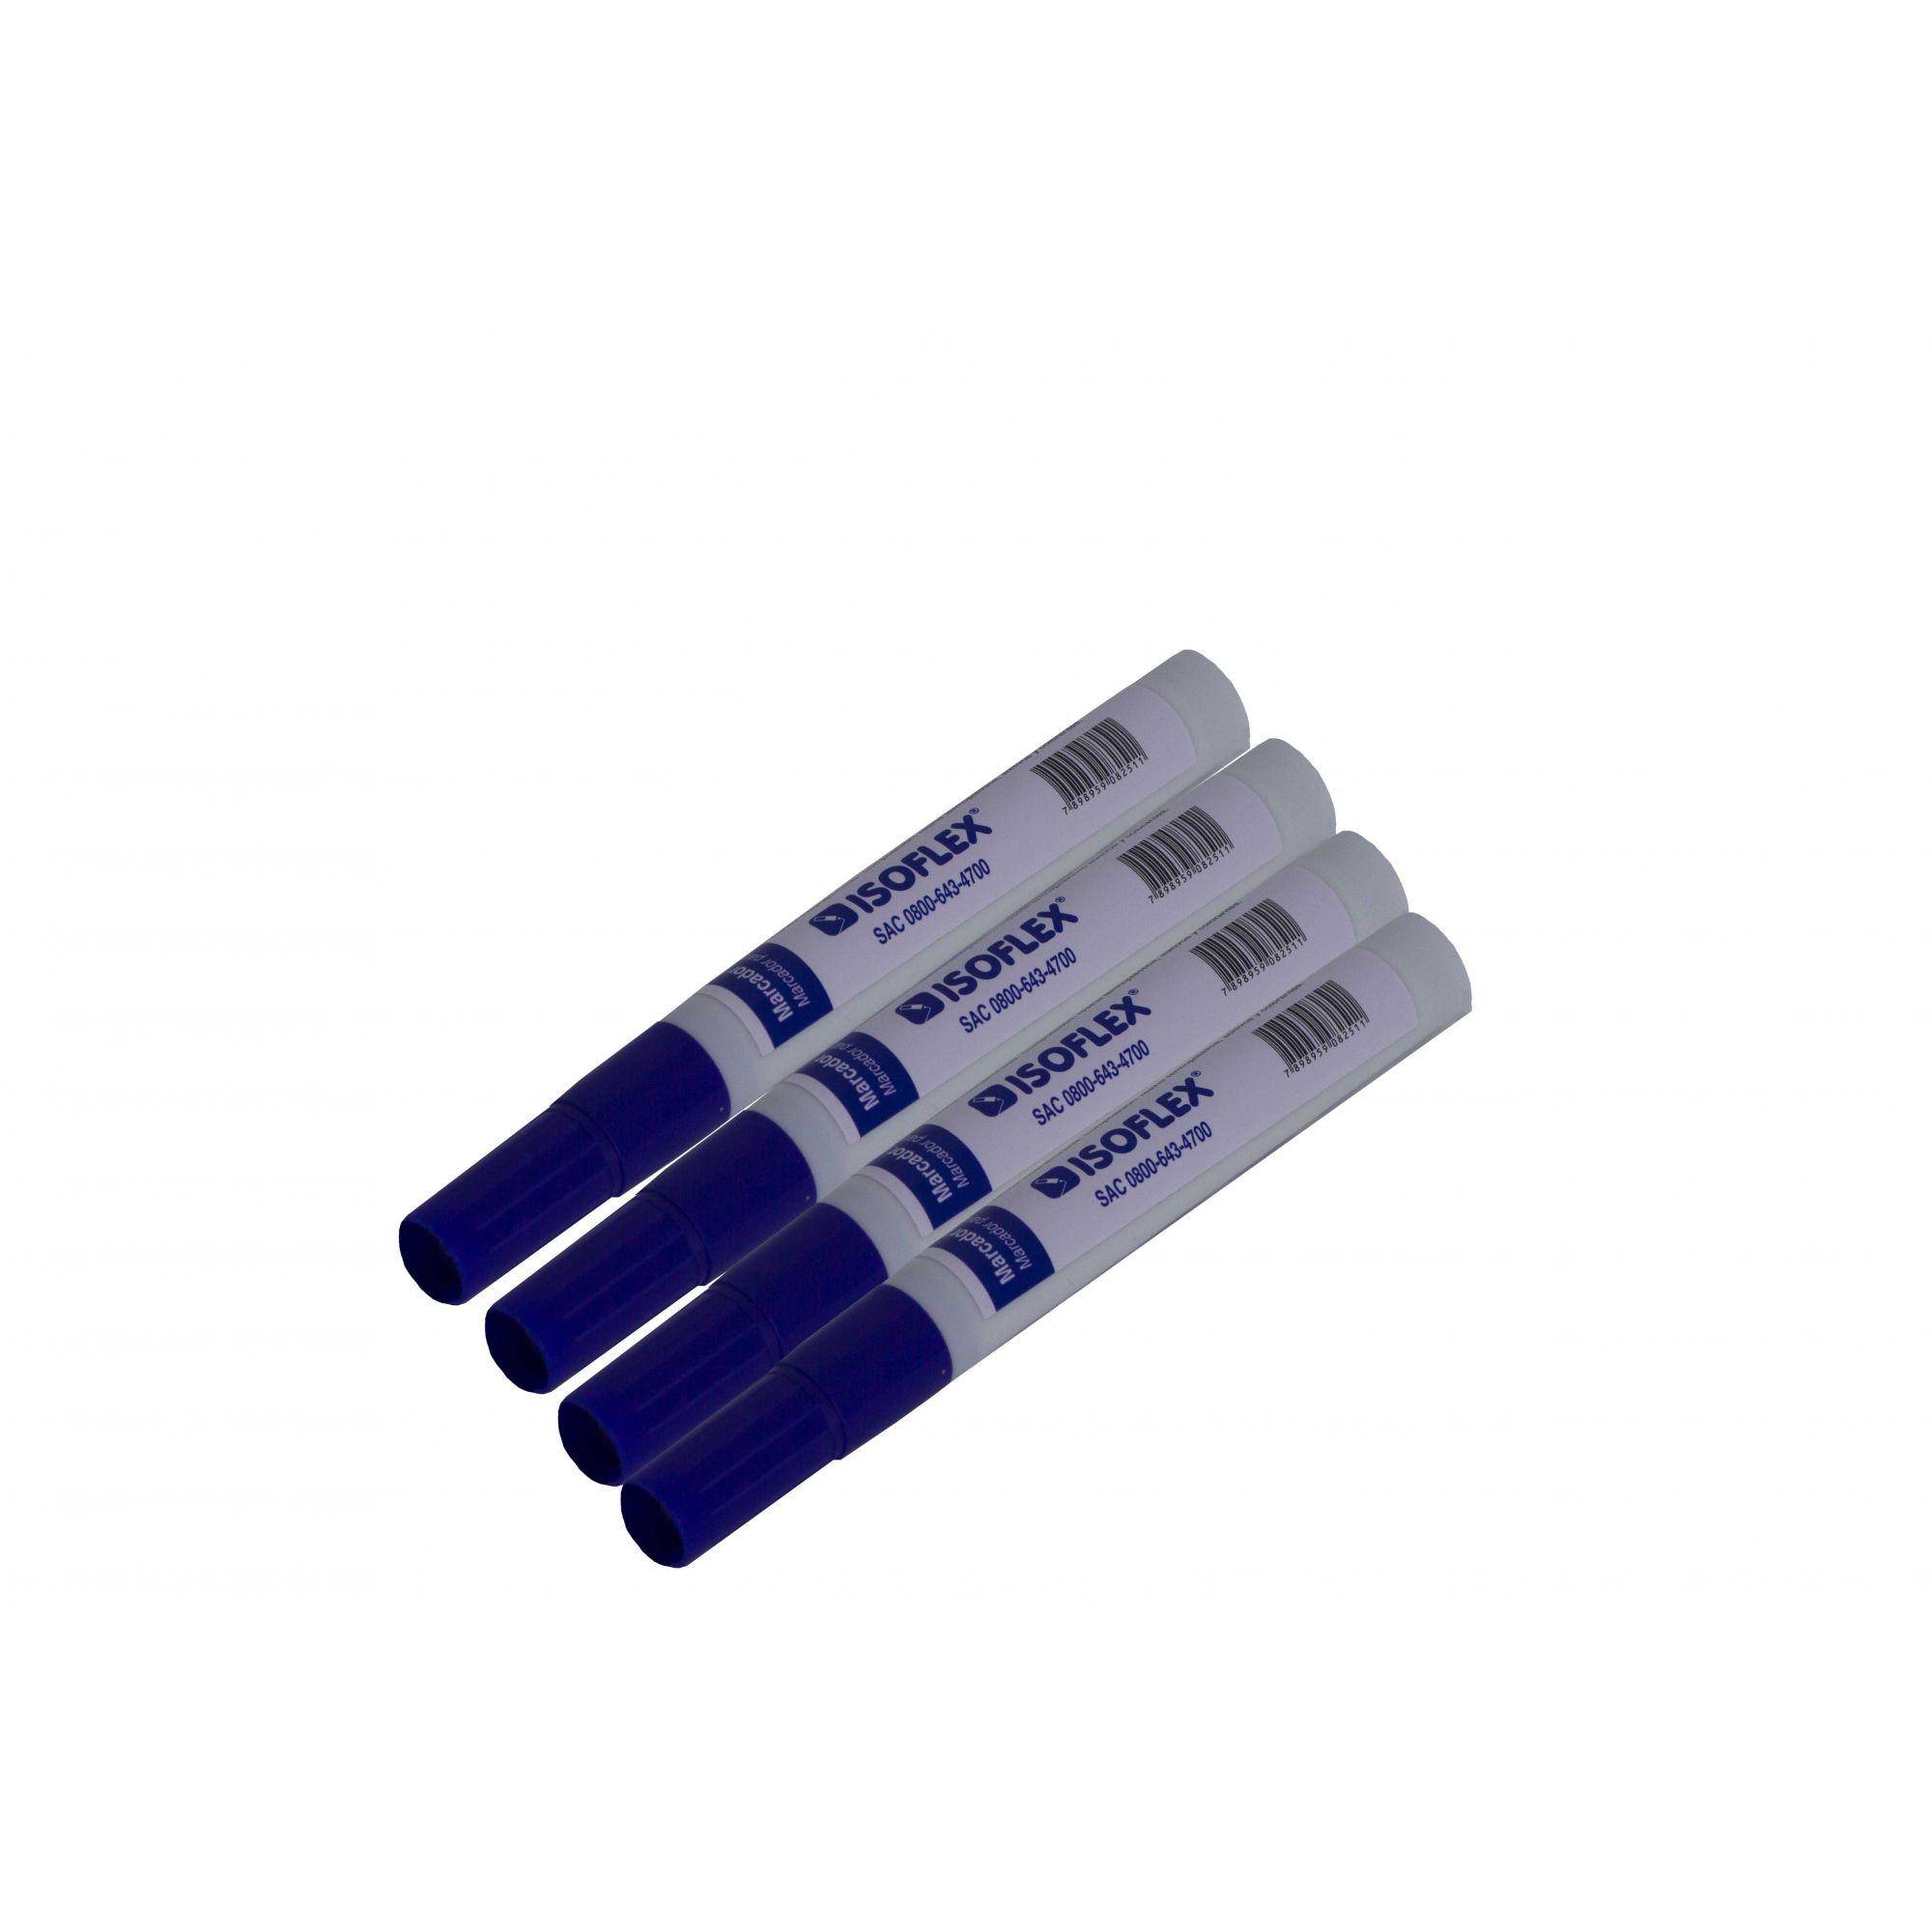 Kit de marcador de quadro branco c / 12 unidades